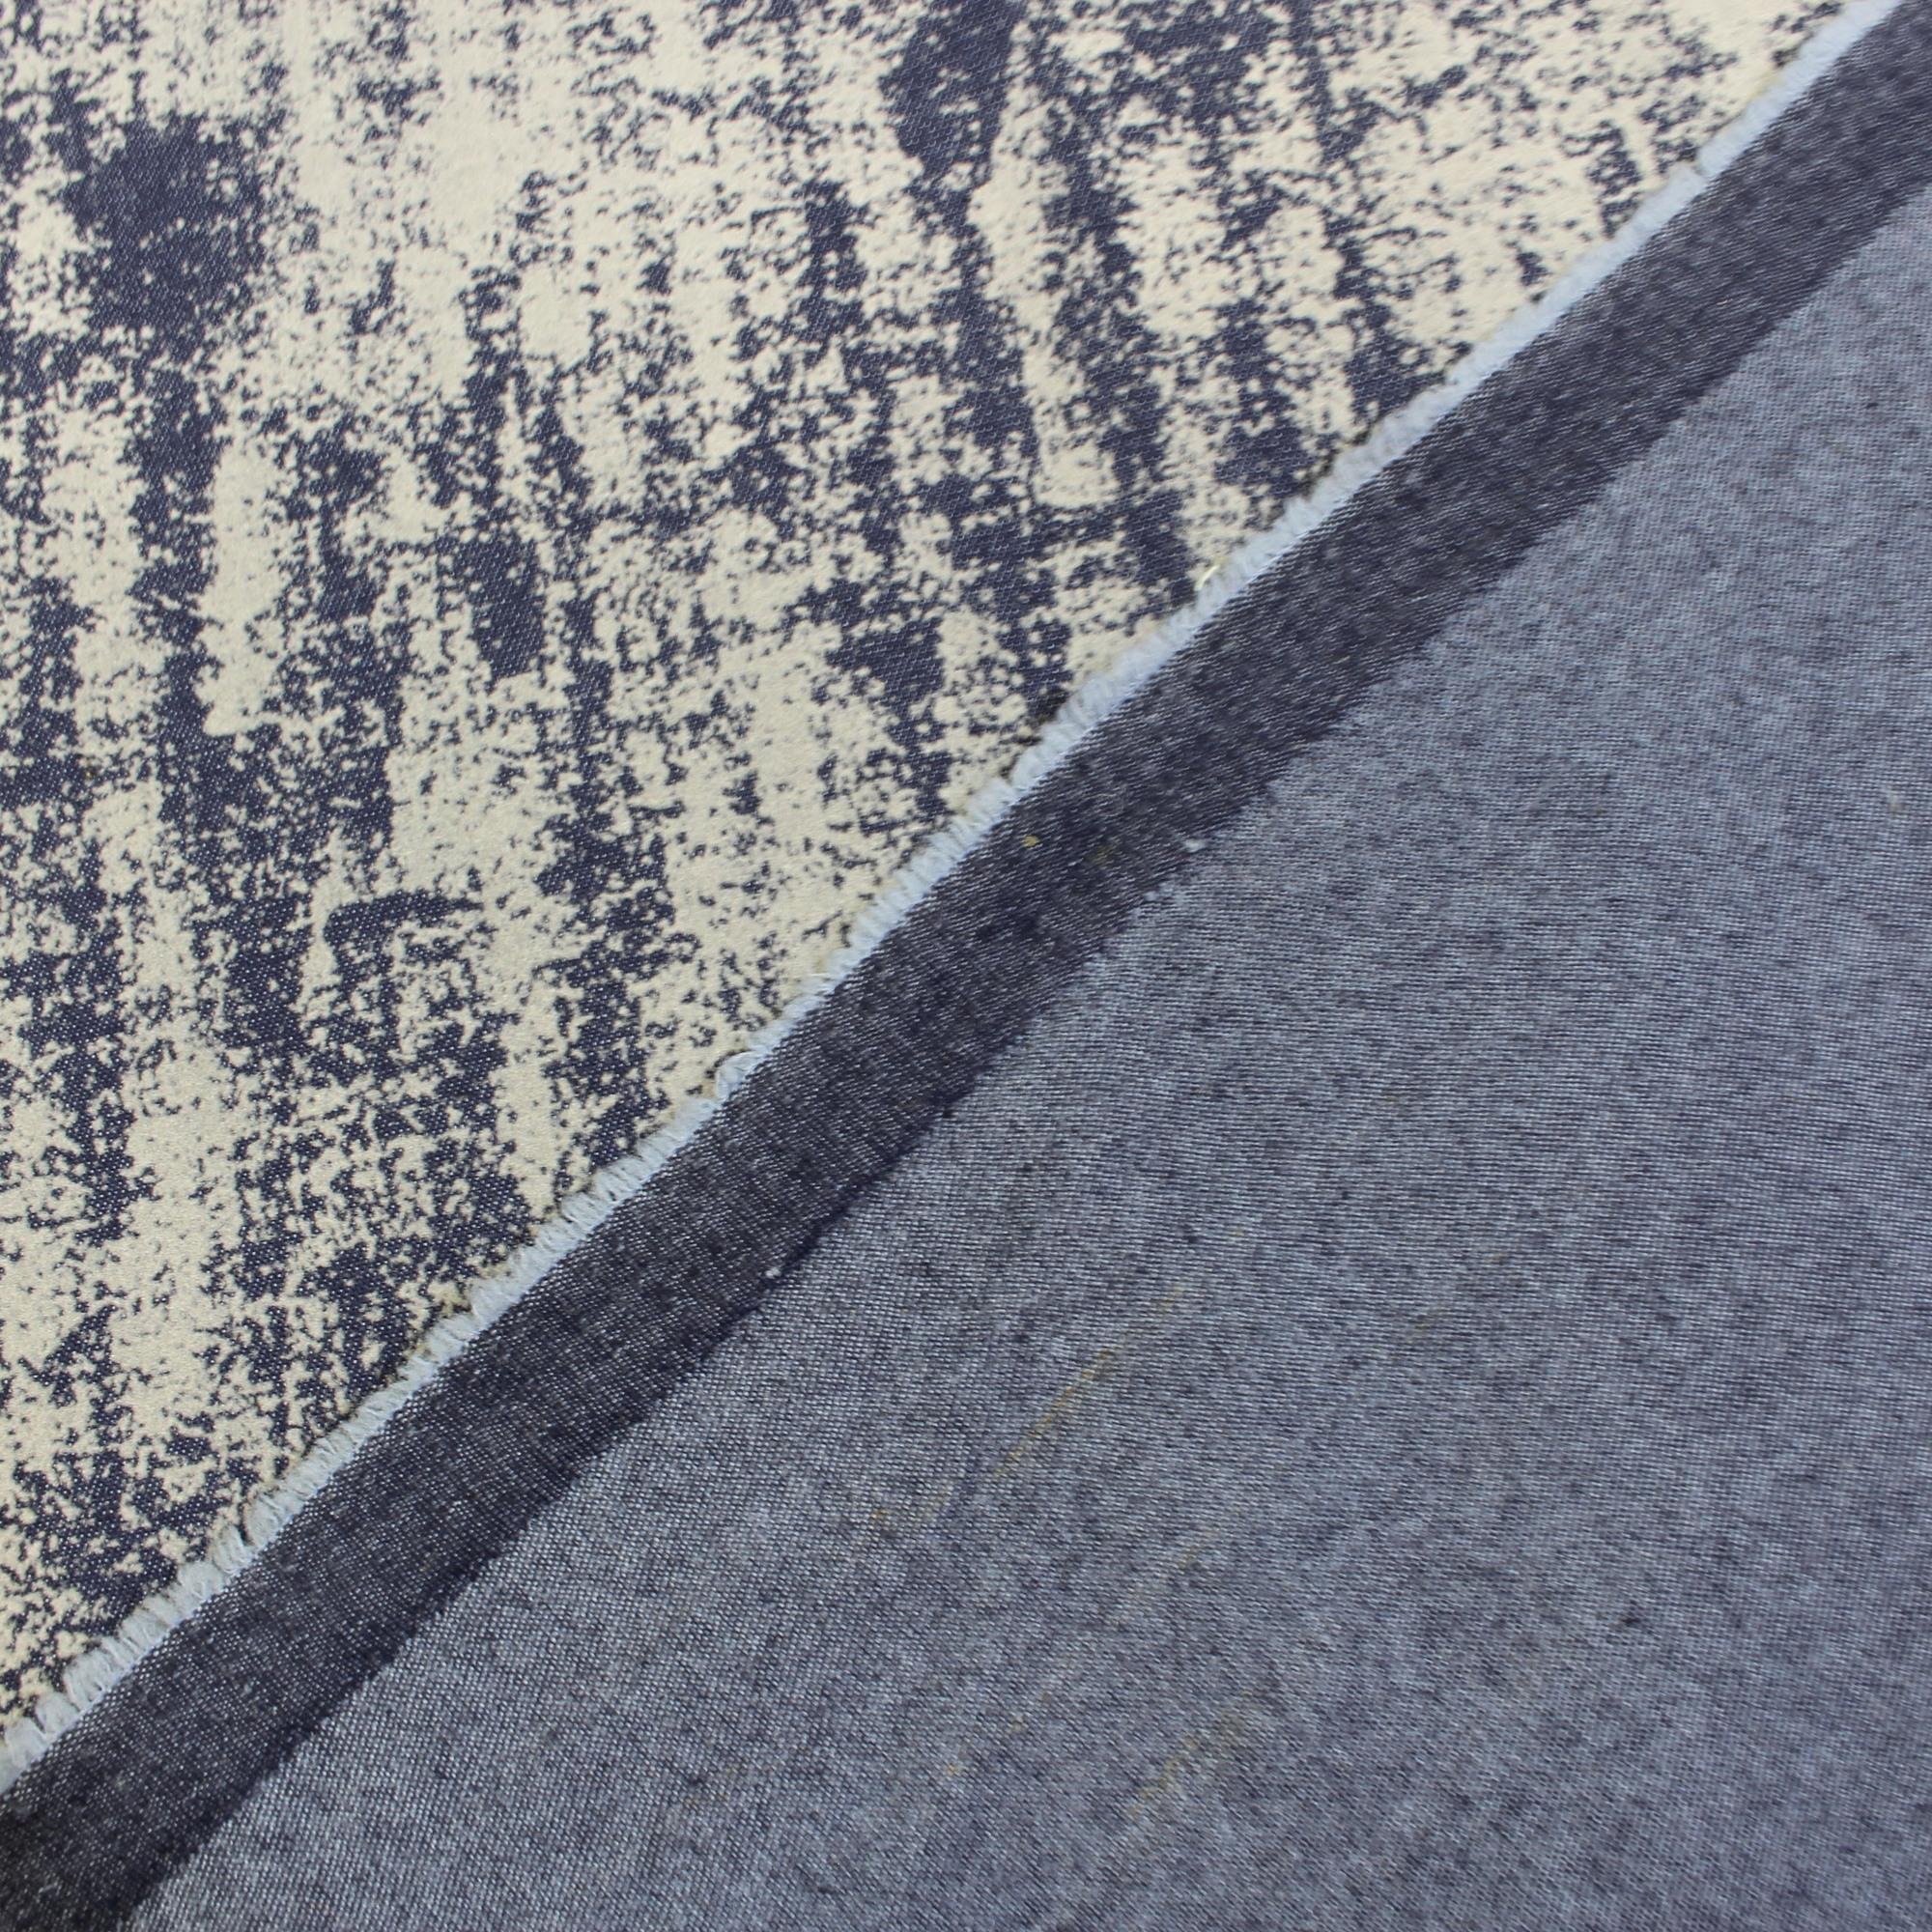 0,5m Jeansstoff Stretch Denim Usedlook Designerstoff Meterware Farbauswahl